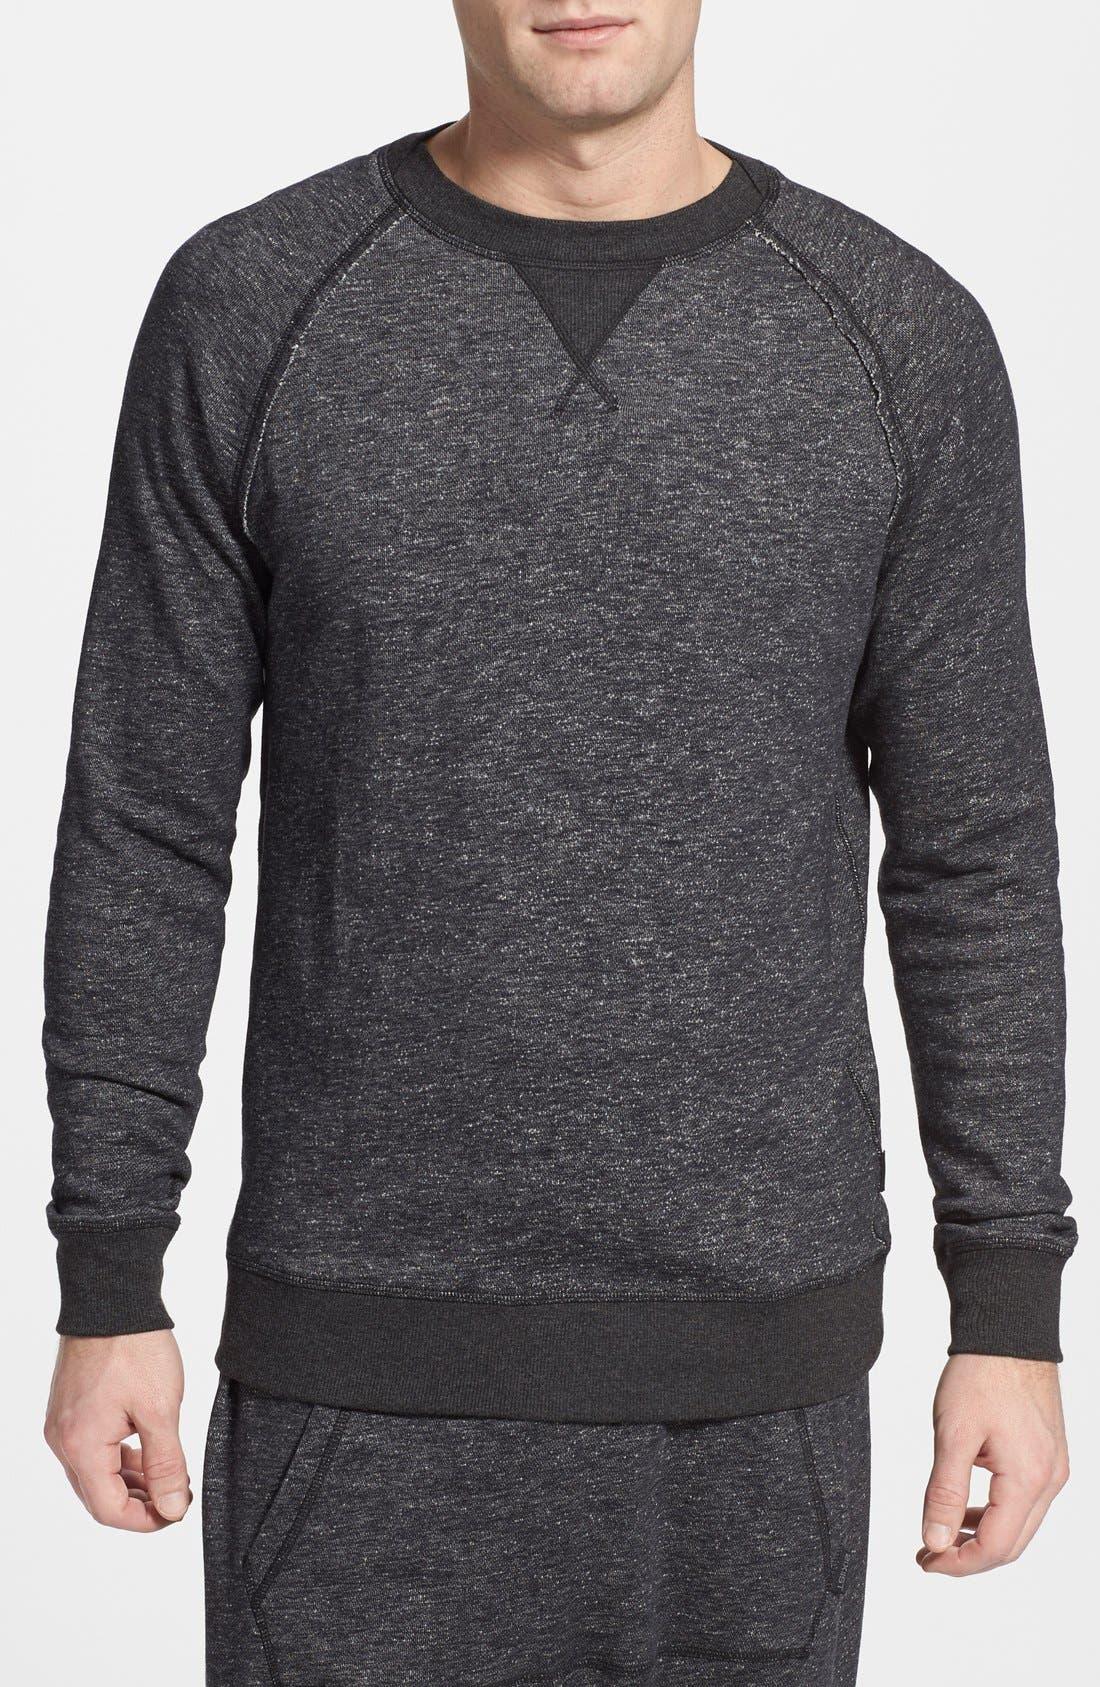 Terry Sweatshirt,                         Main,                         color, Black Heather